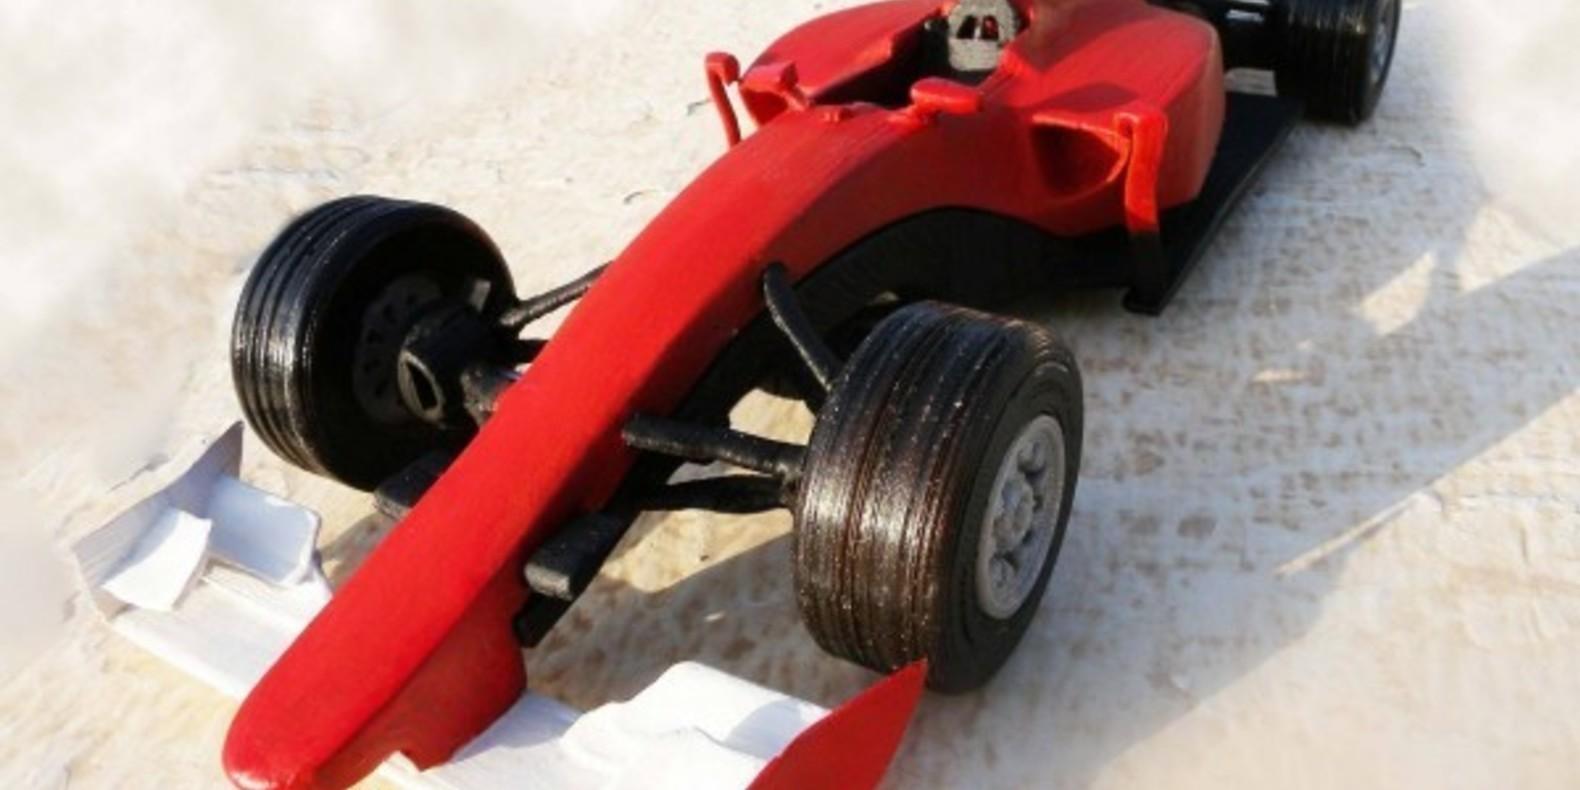 Ferrari F1 2015 mao casella maurizio 3D printed maquette model imprimé en 3D fichier STL cults 1